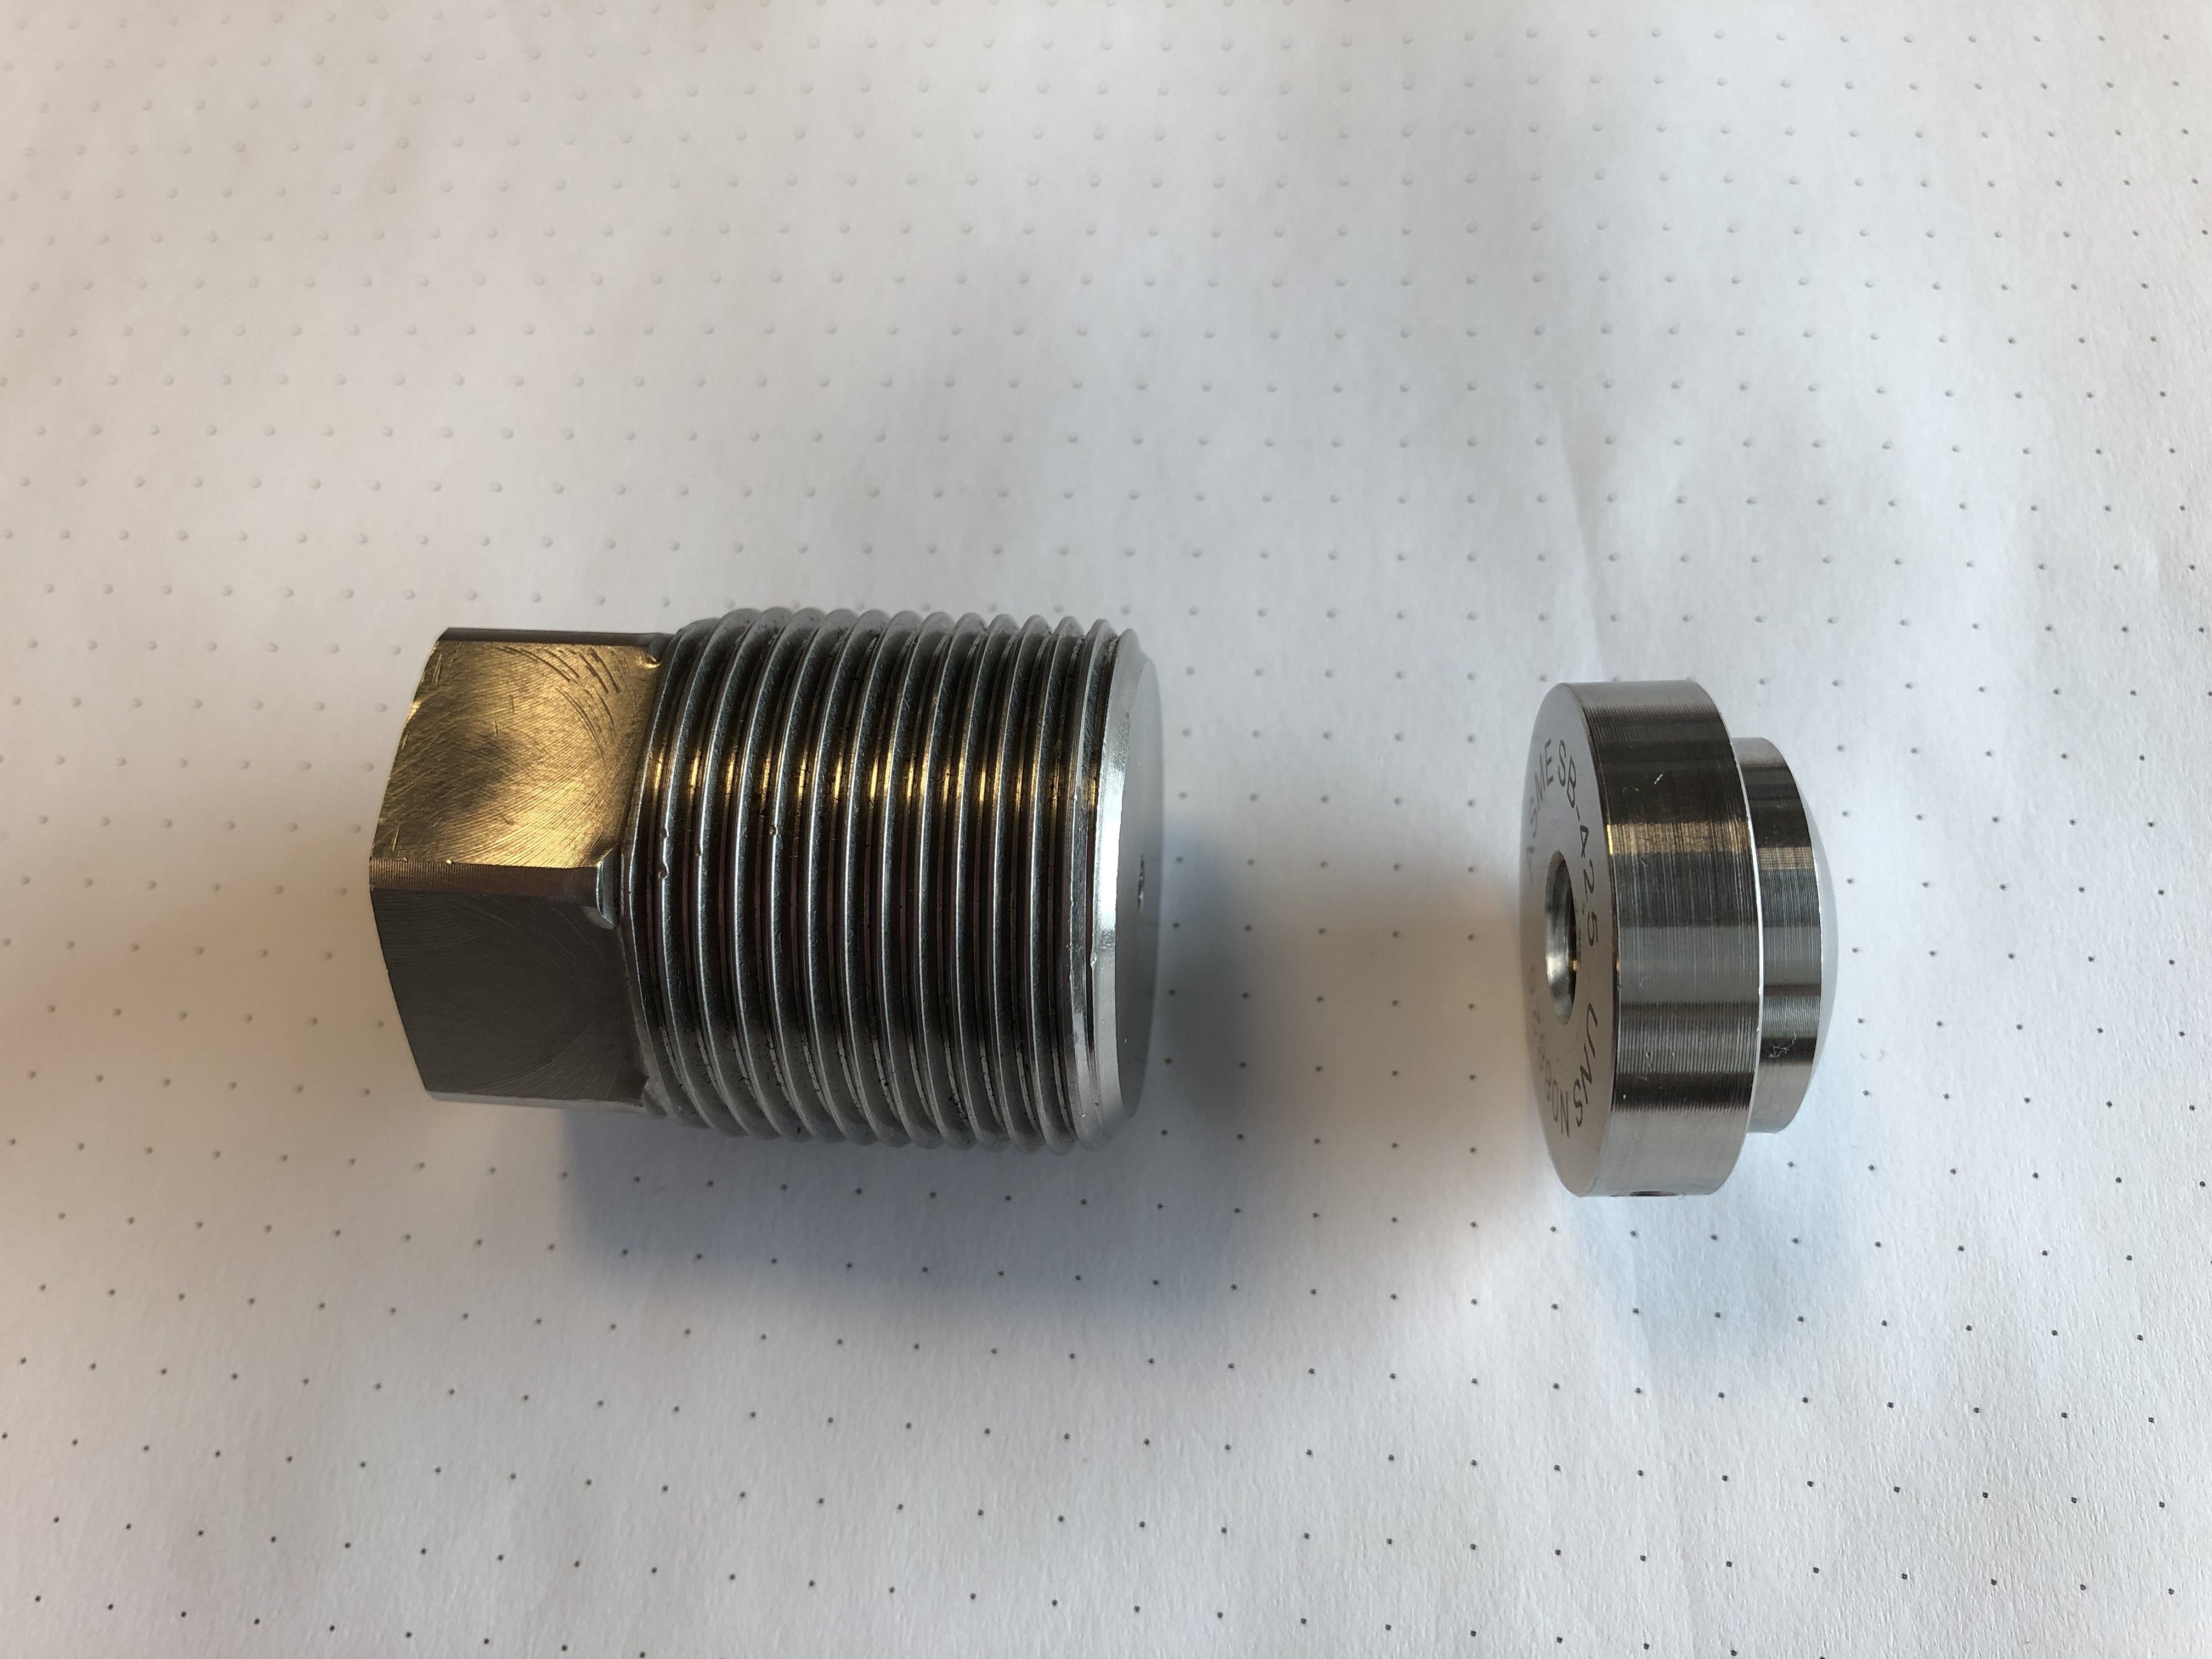 Double Plug - Bronswerk Heat Transfer-min